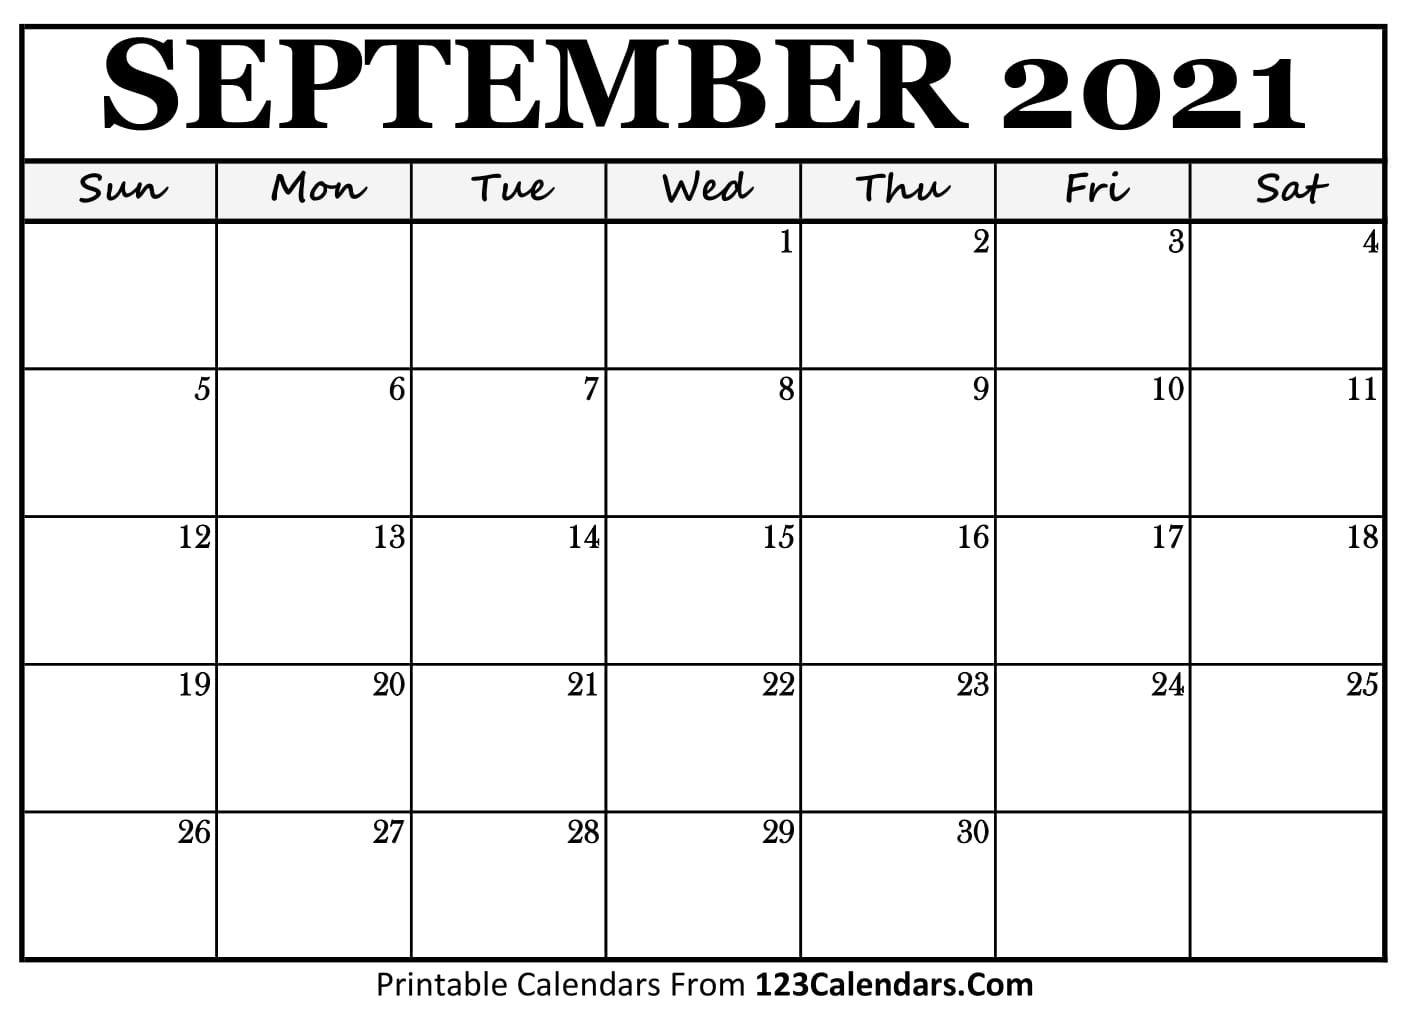 Printable September 2021 Calendar Templates | 123calendars